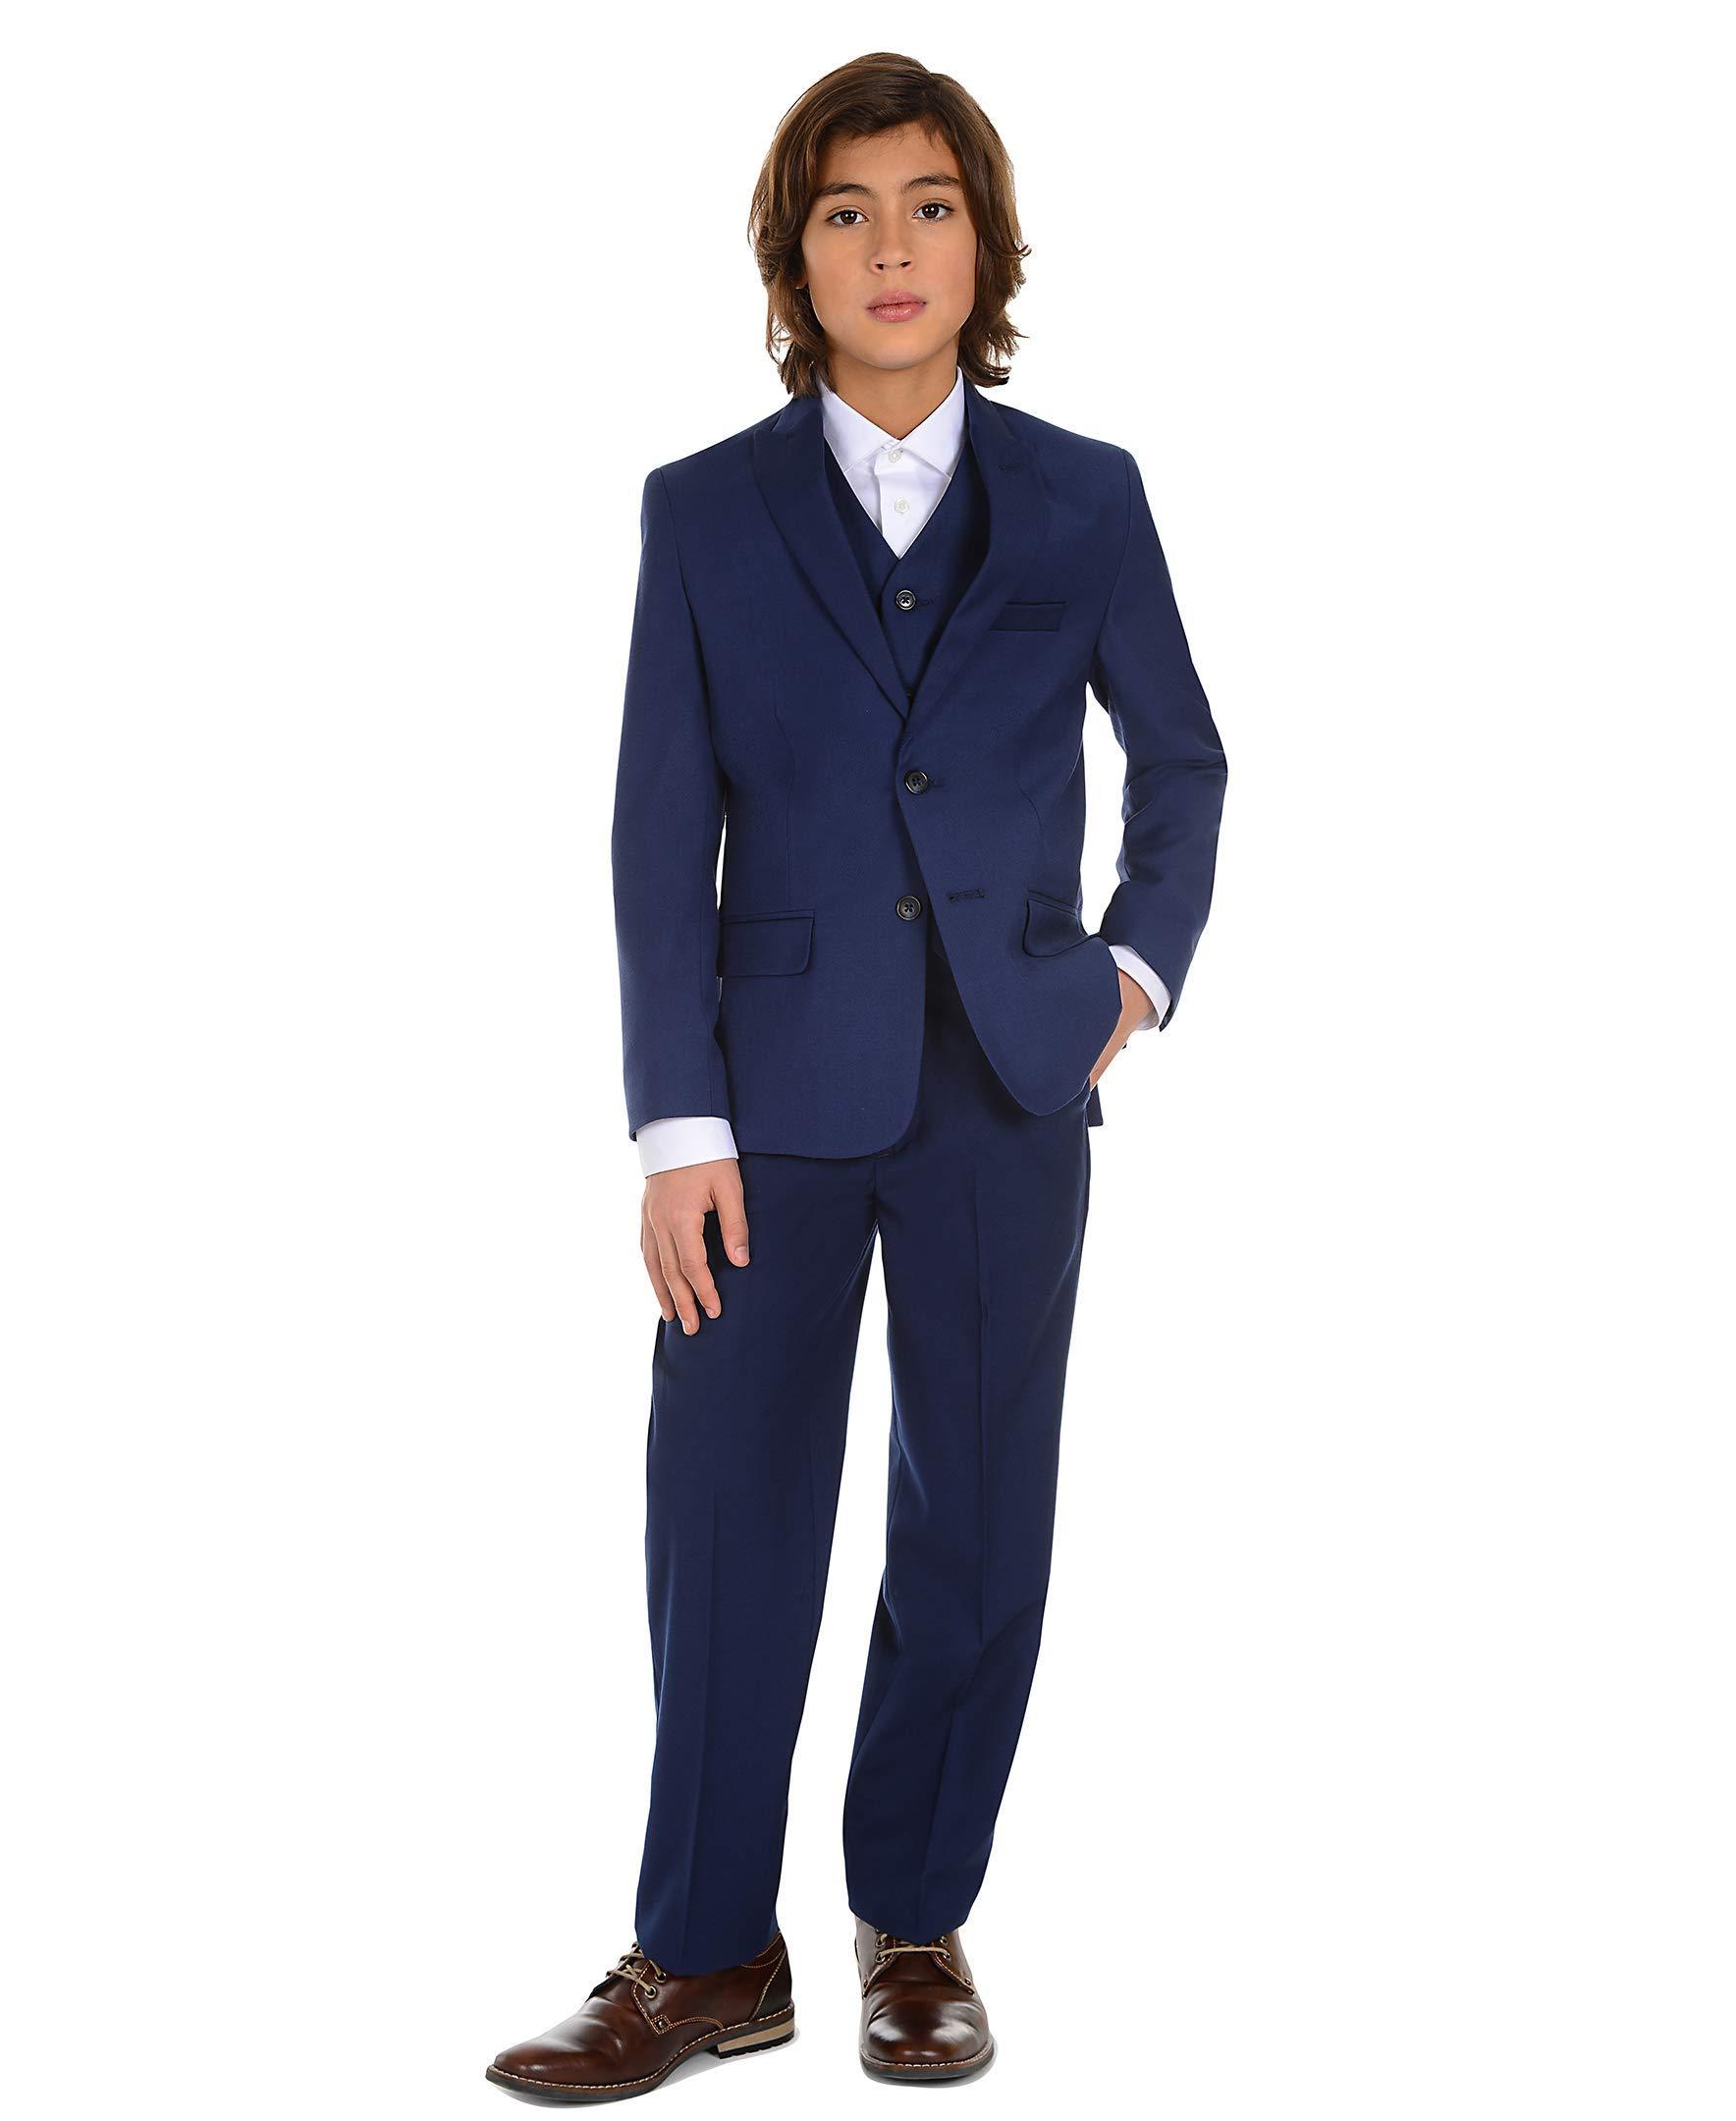 Calvin Klein Big Boys' Flat Front Dress Pant, Infinite Blue, 10 by Calvin Klein (Image #5)